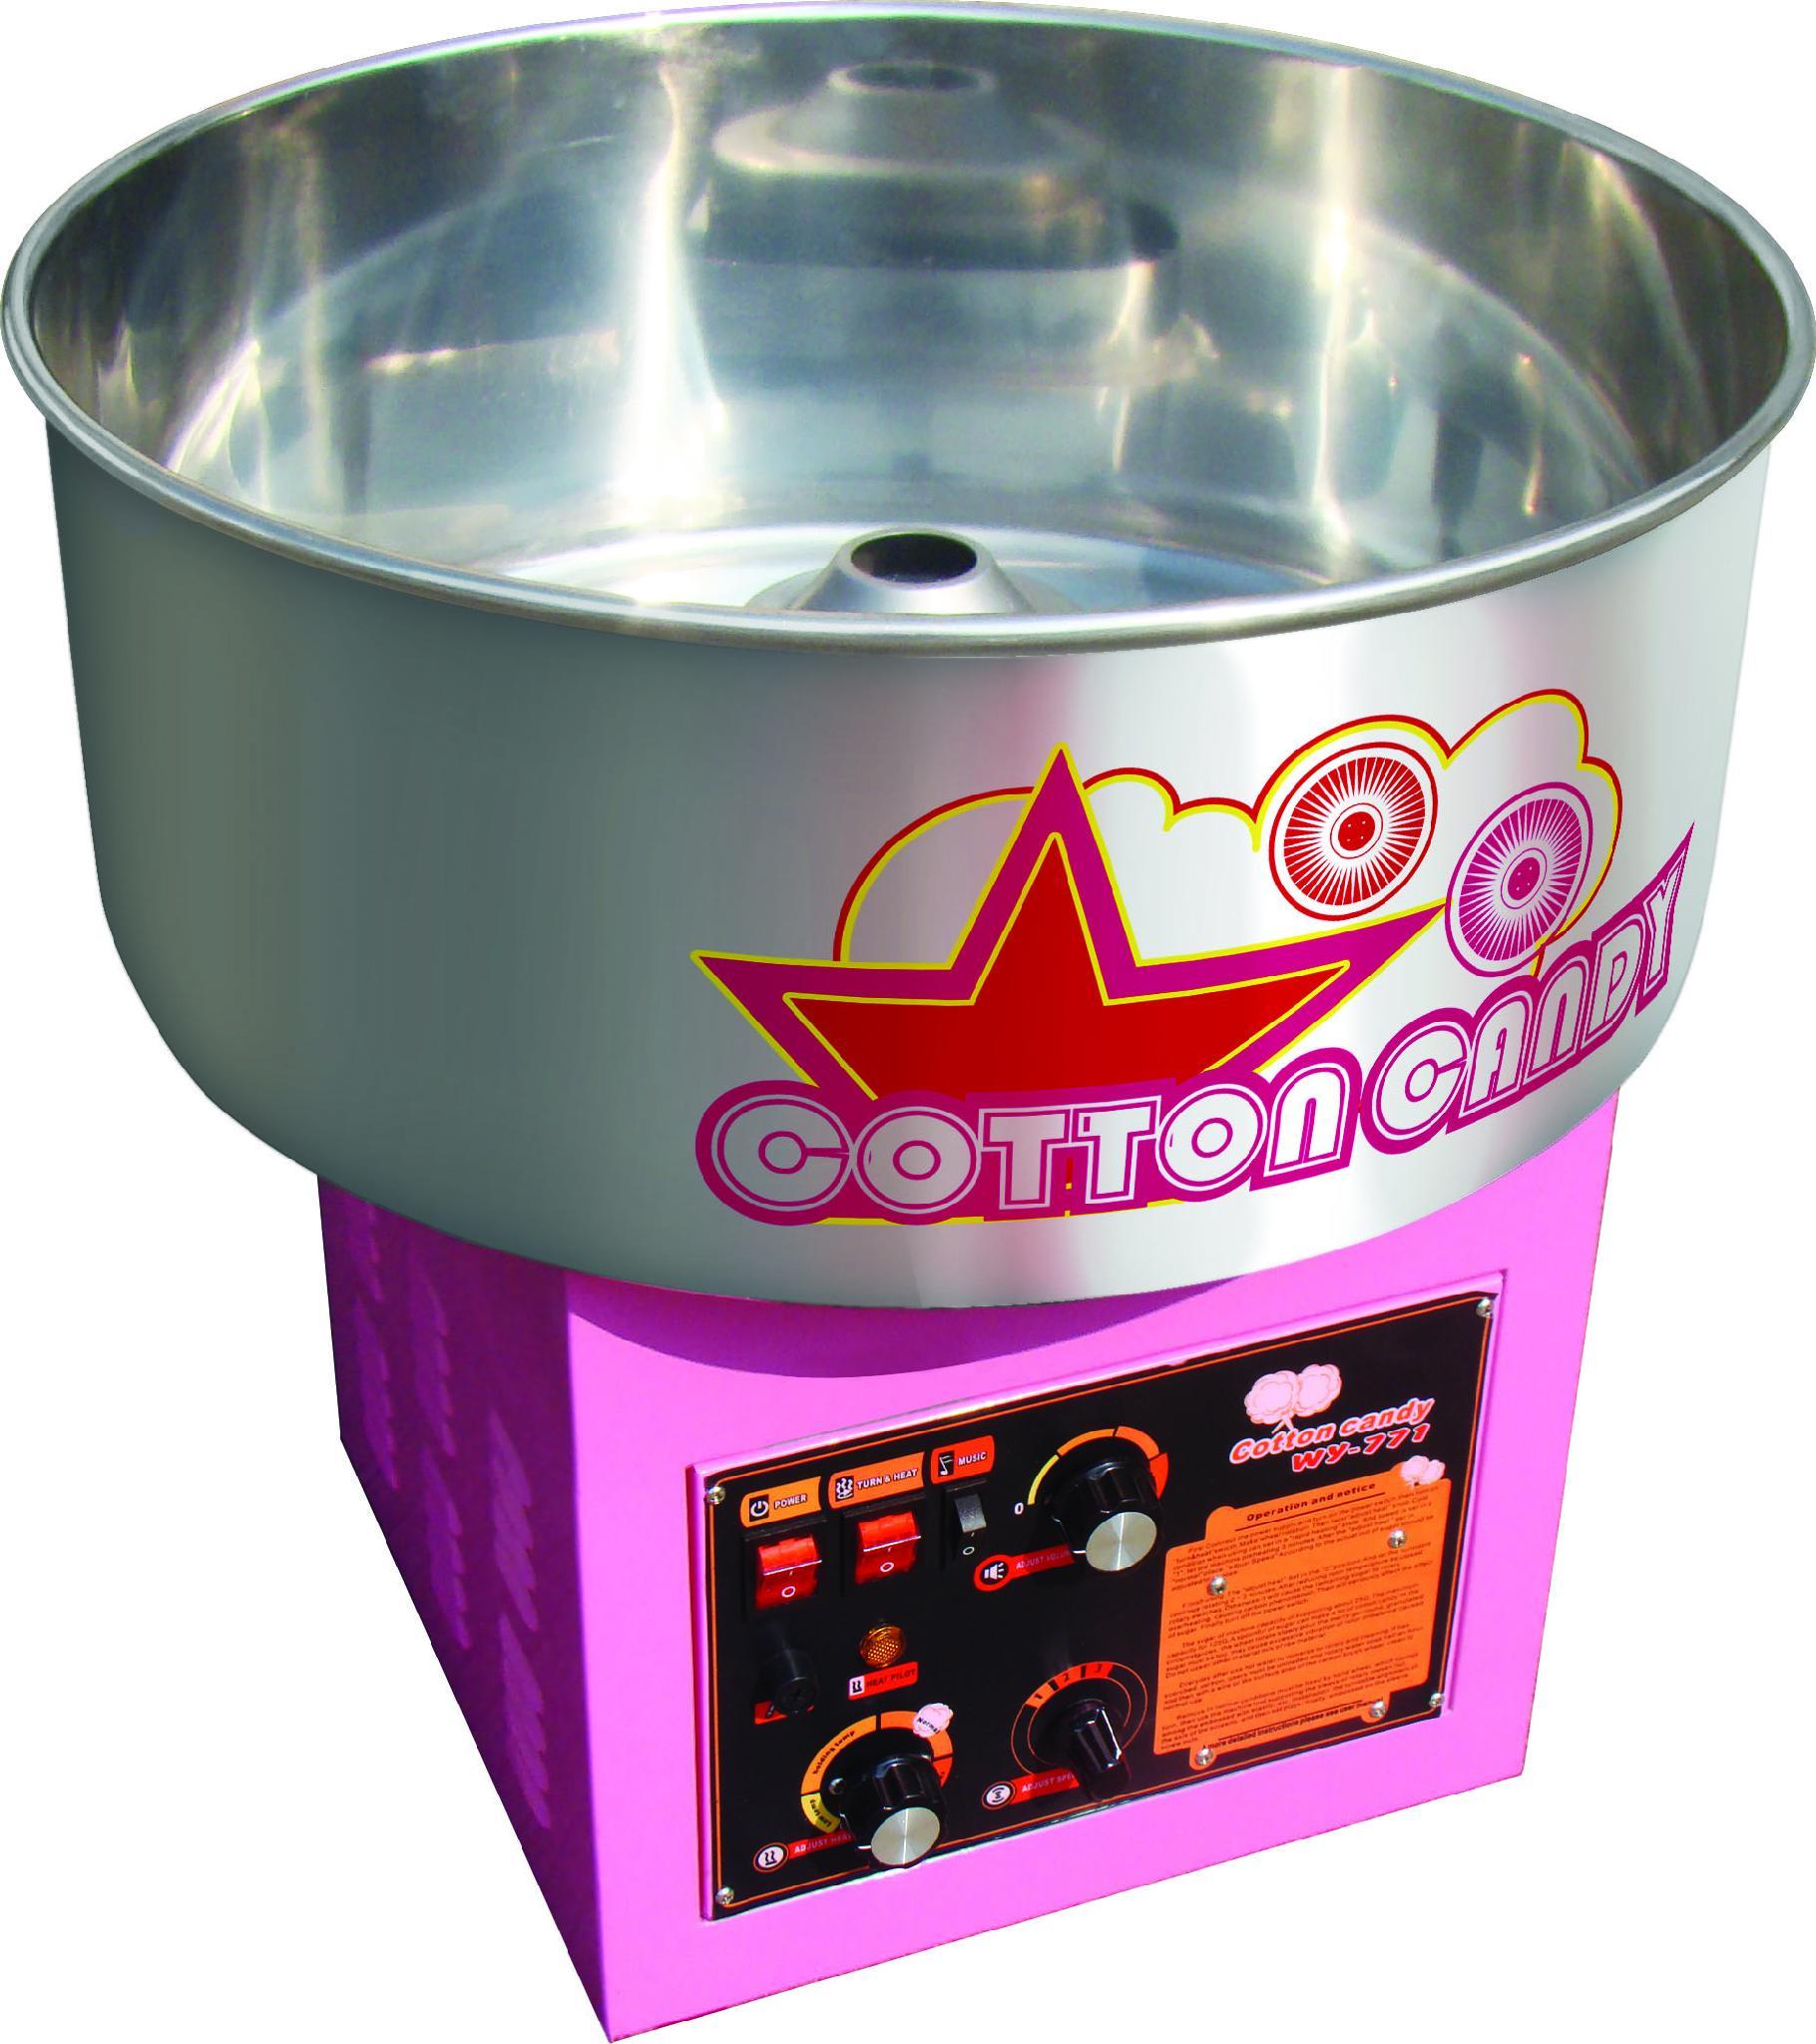 WY-771商用电棉花糖机,全自动花式拉丝棉花糖机 1